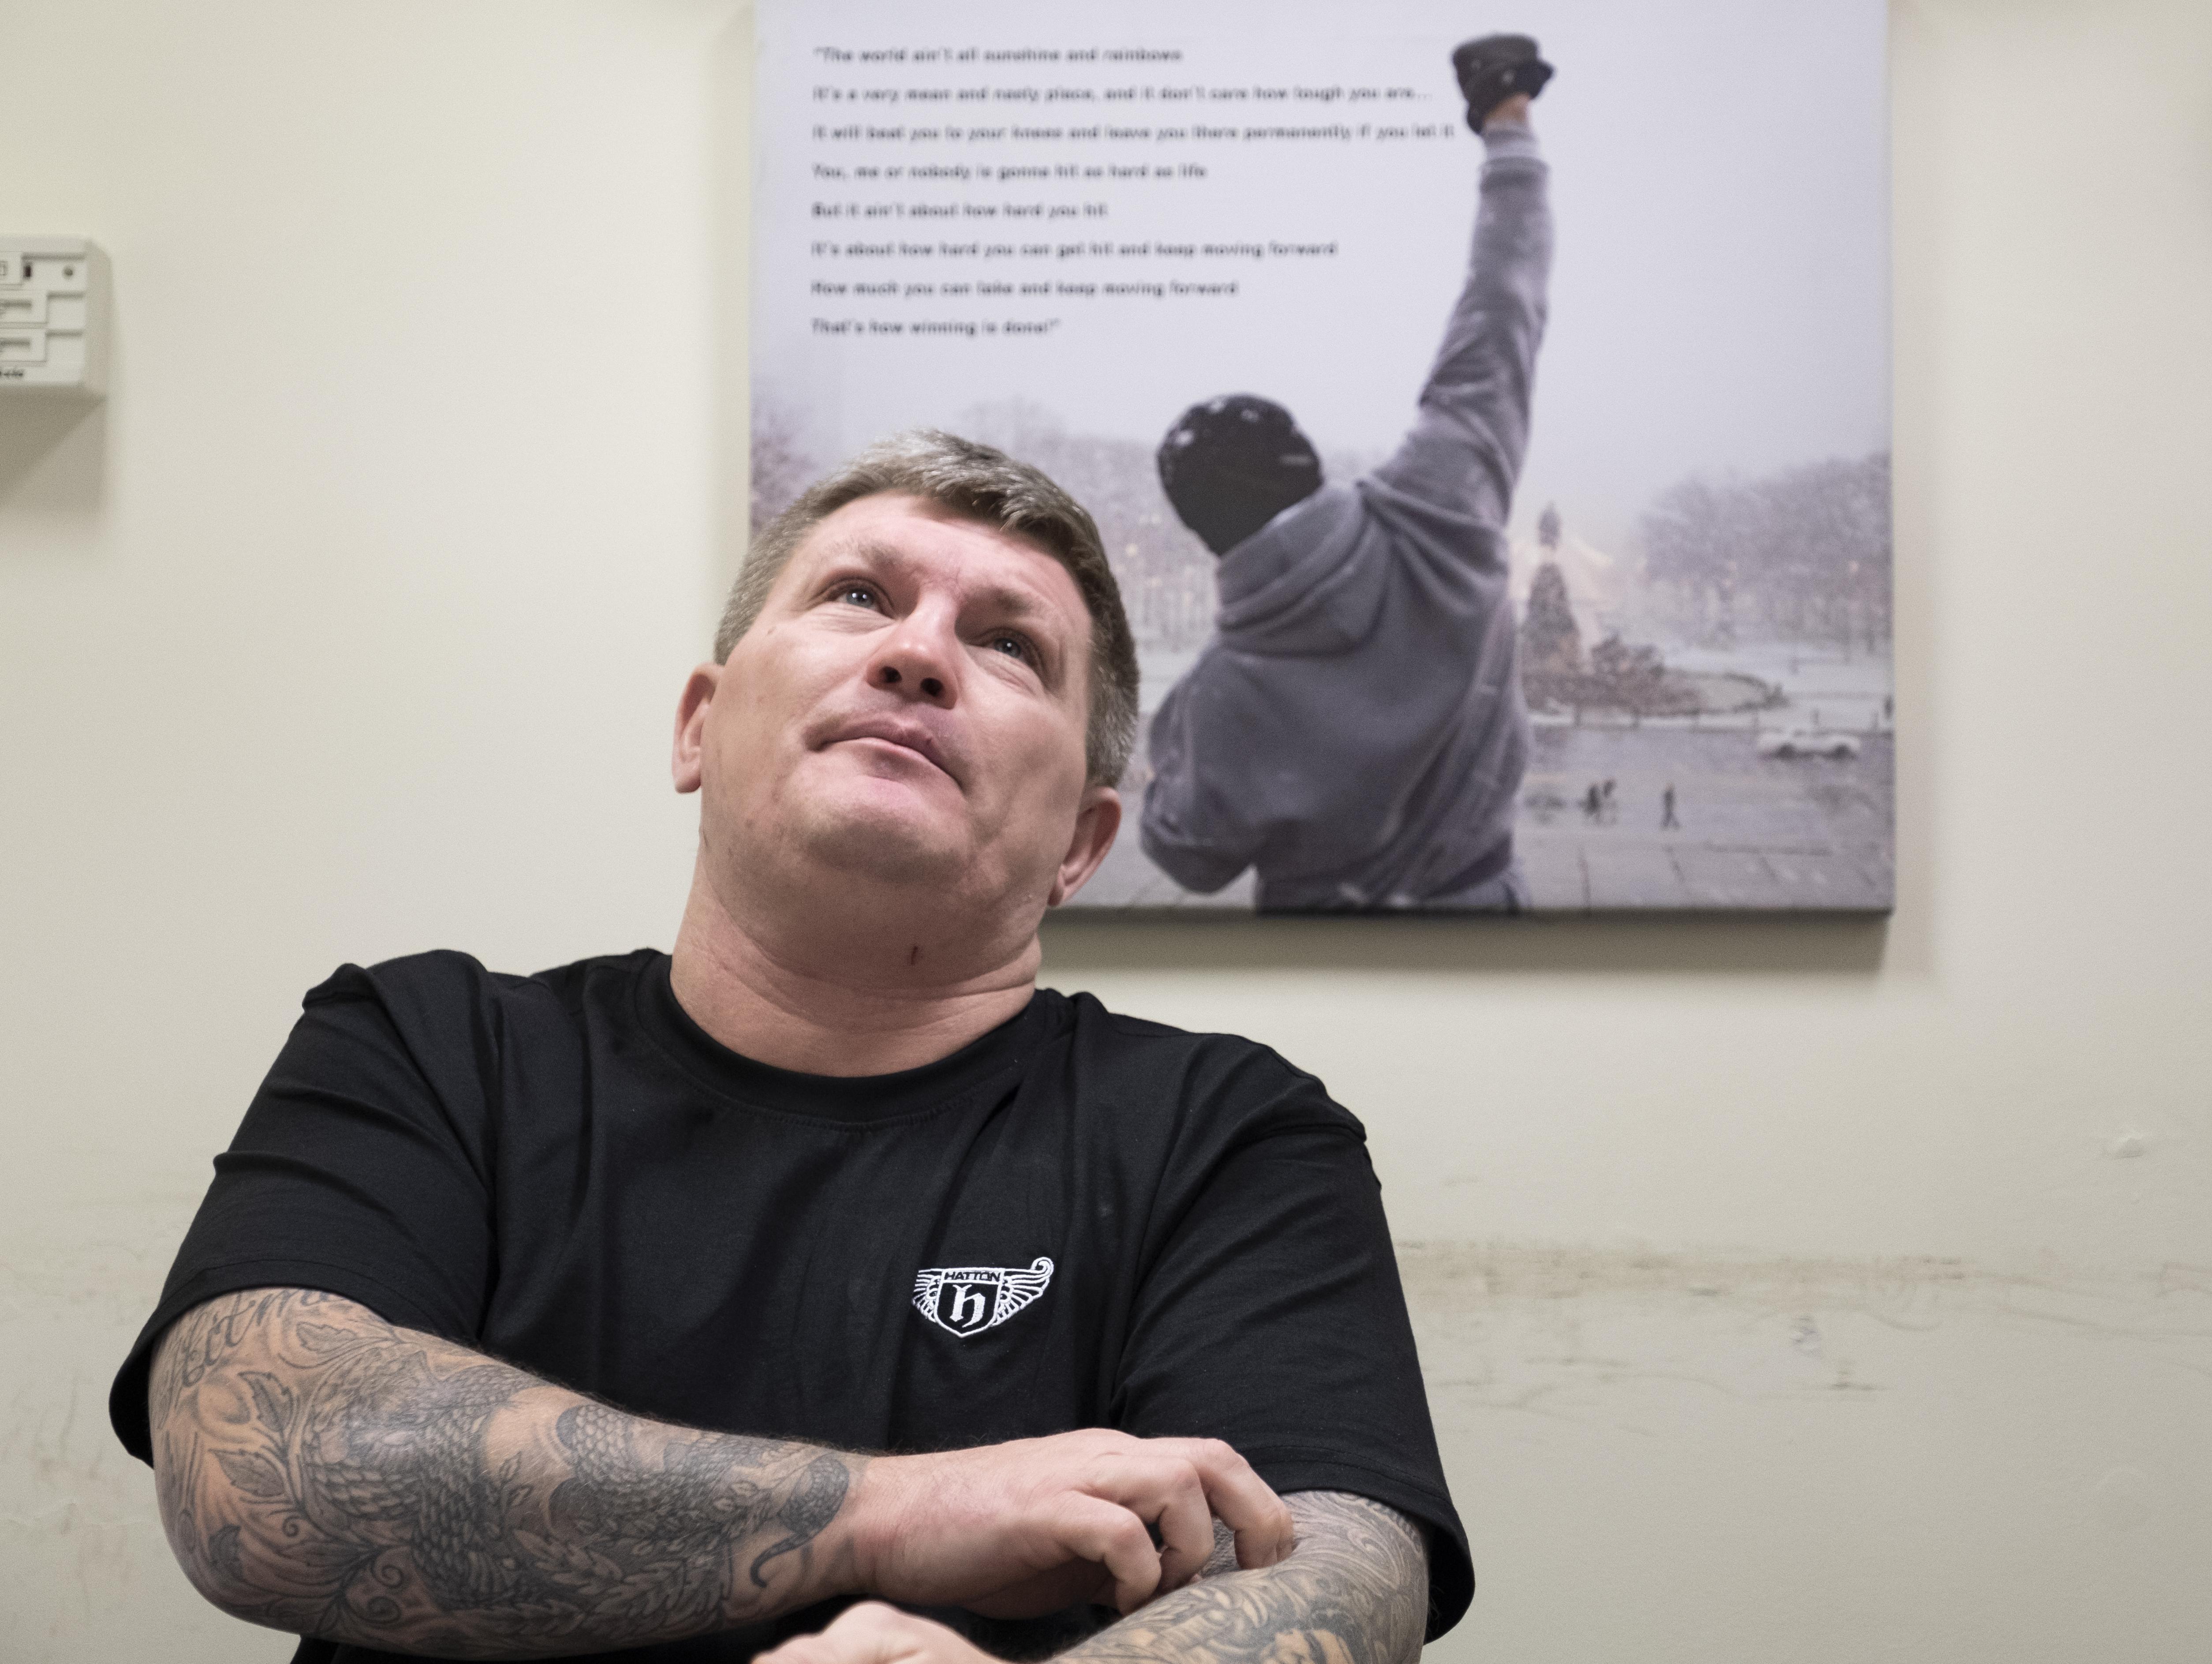 Hatton believes he has always had depression